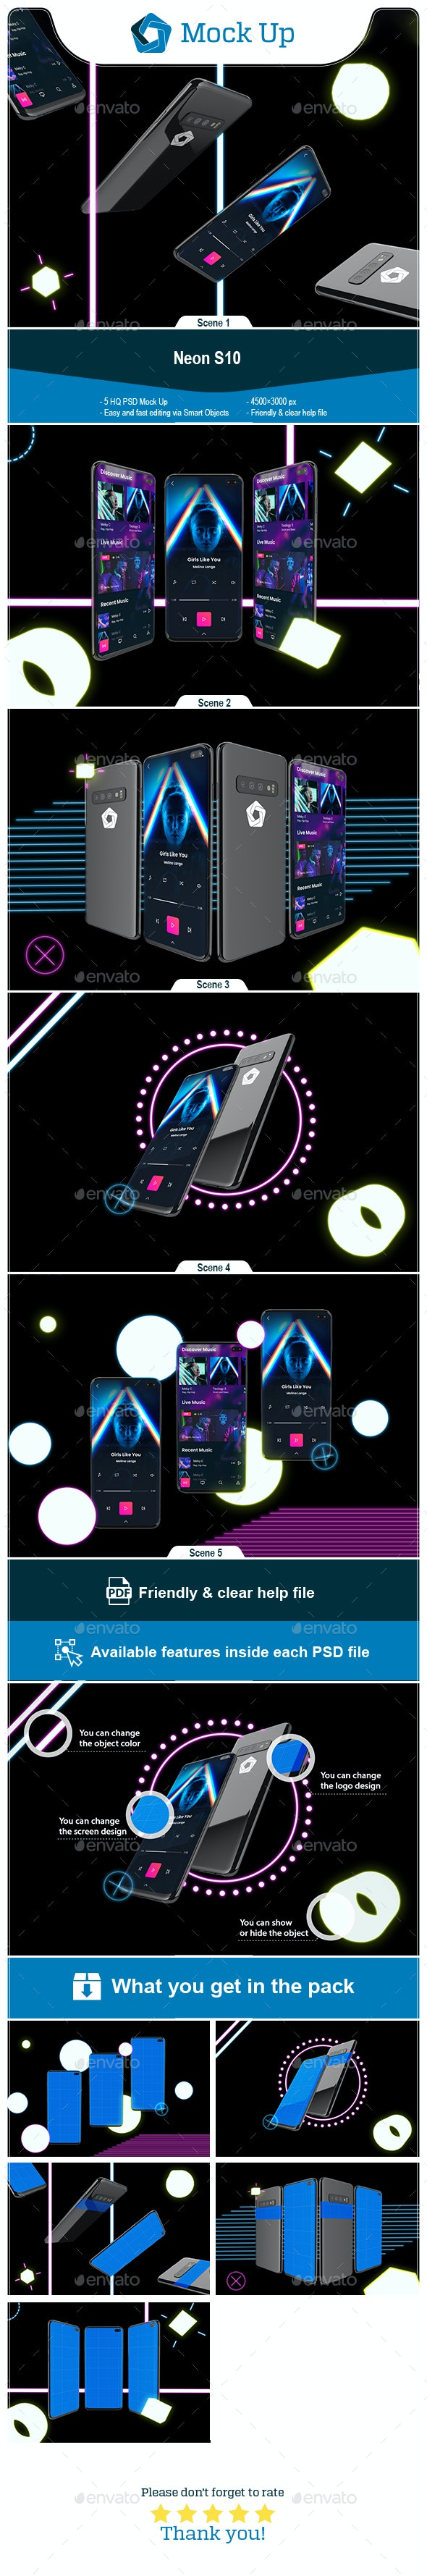 Neon S10 mockup - Mobile Displays